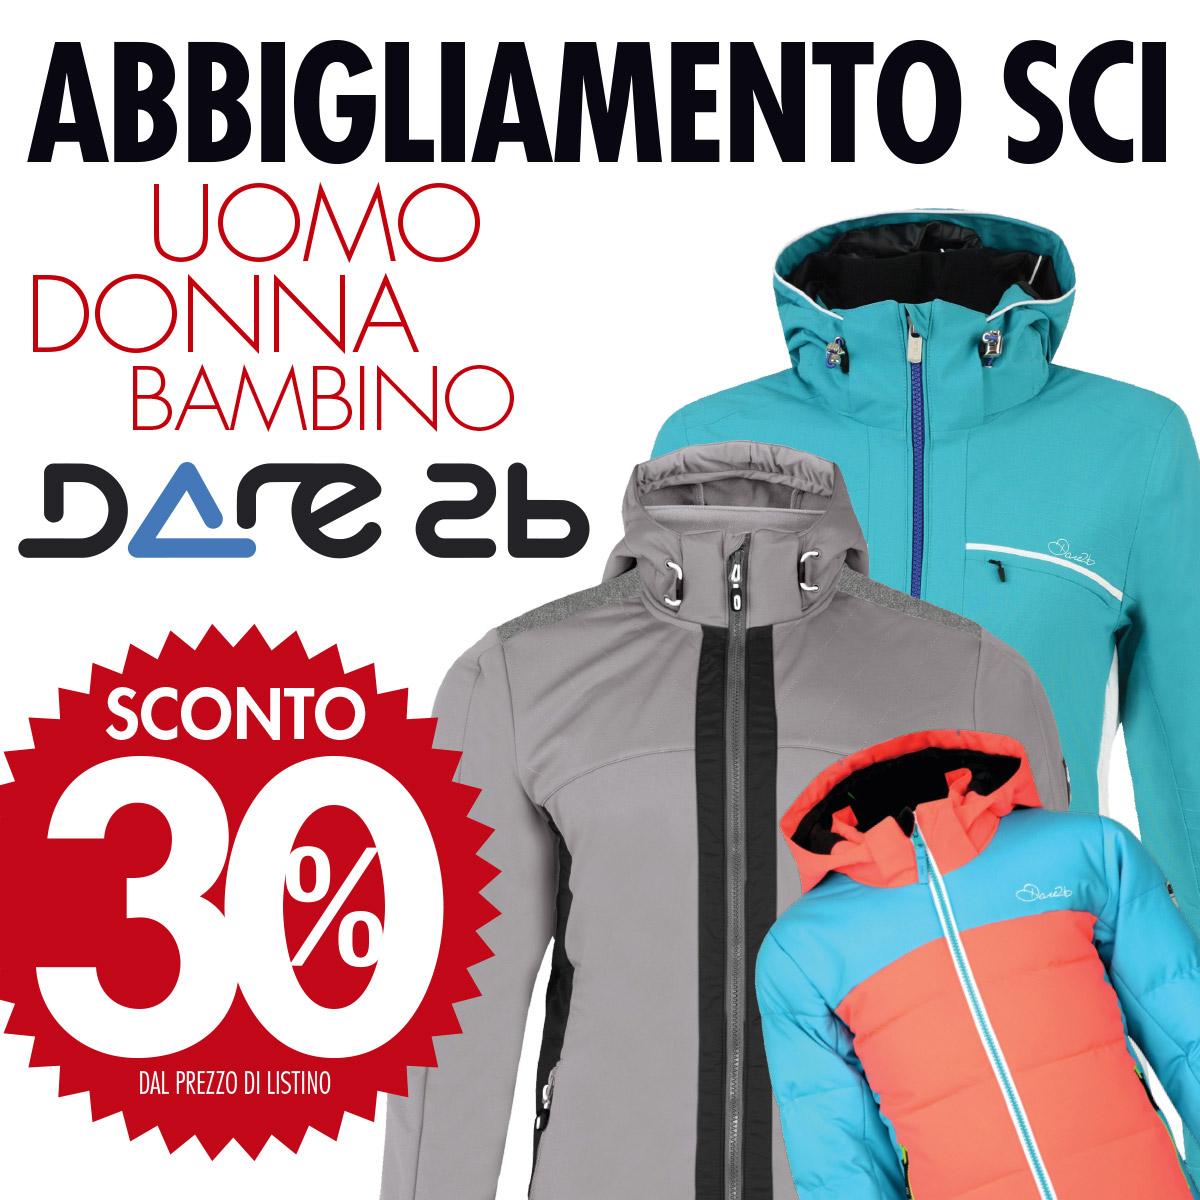 Promo-VERNANTE-DARE2B_Sconto30_BannerNewsletter2